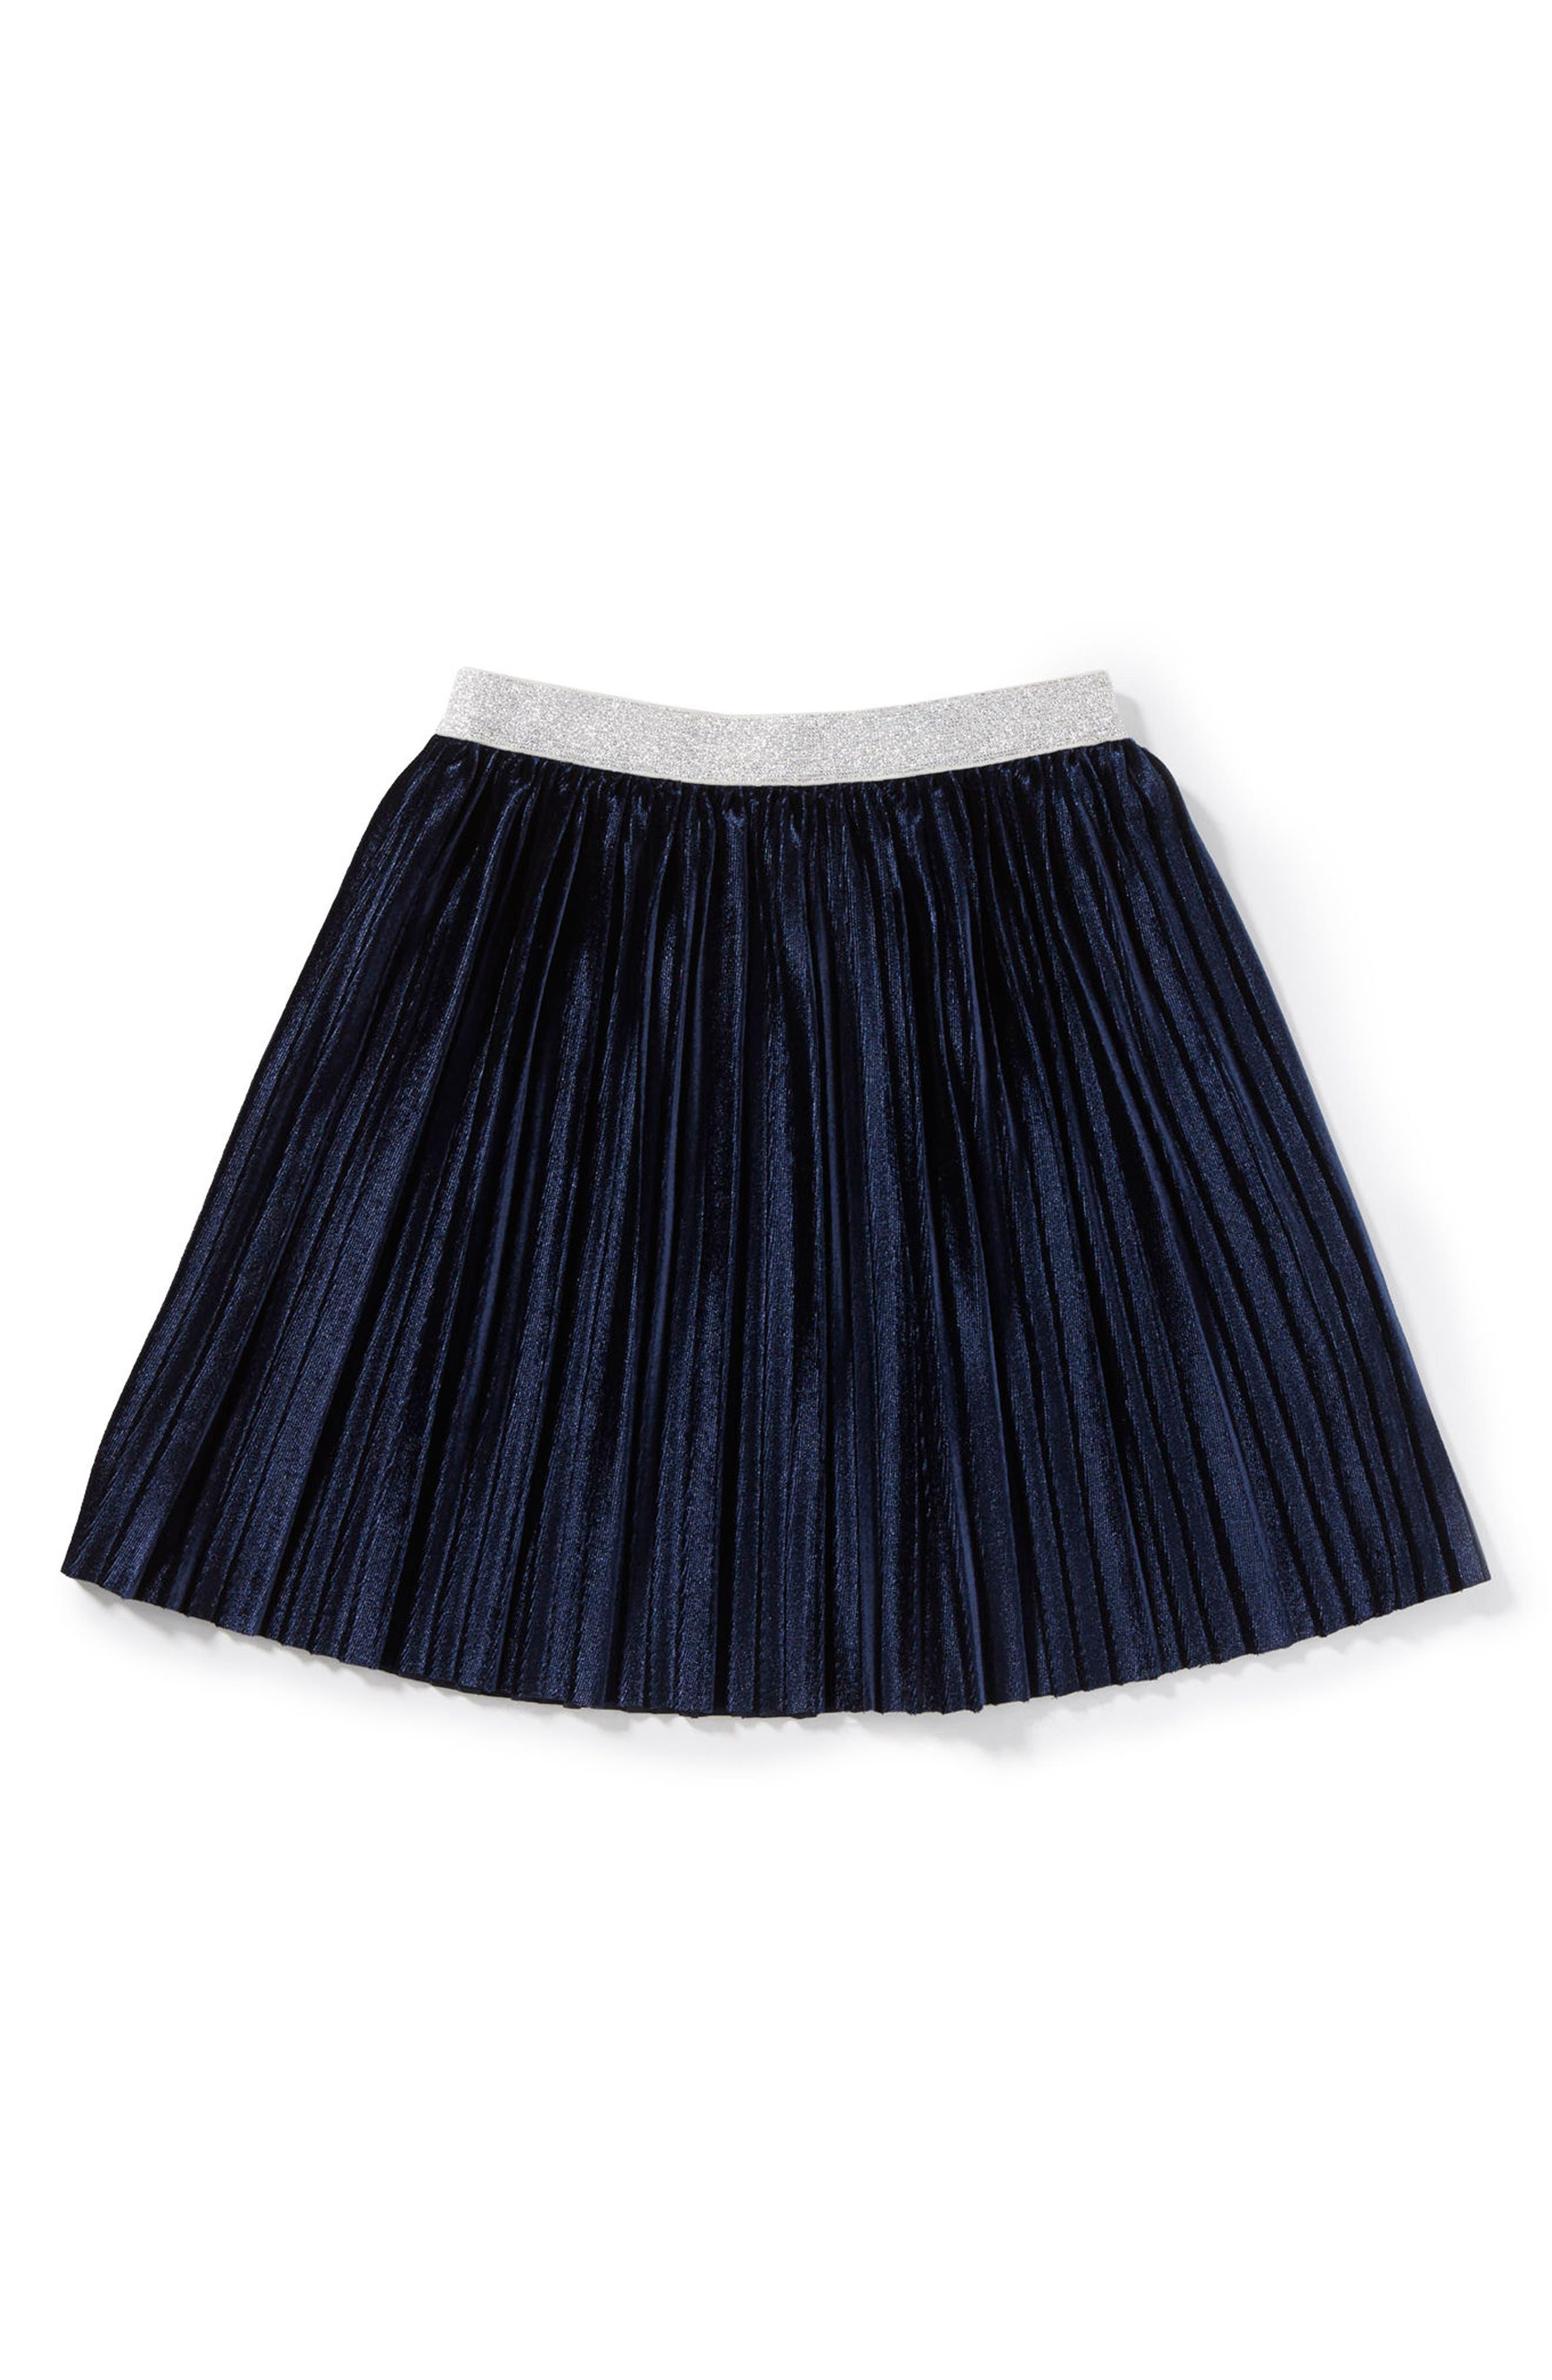 Marissa Pleated Skirt,                             Main thumbnail 1, color,                             Navy